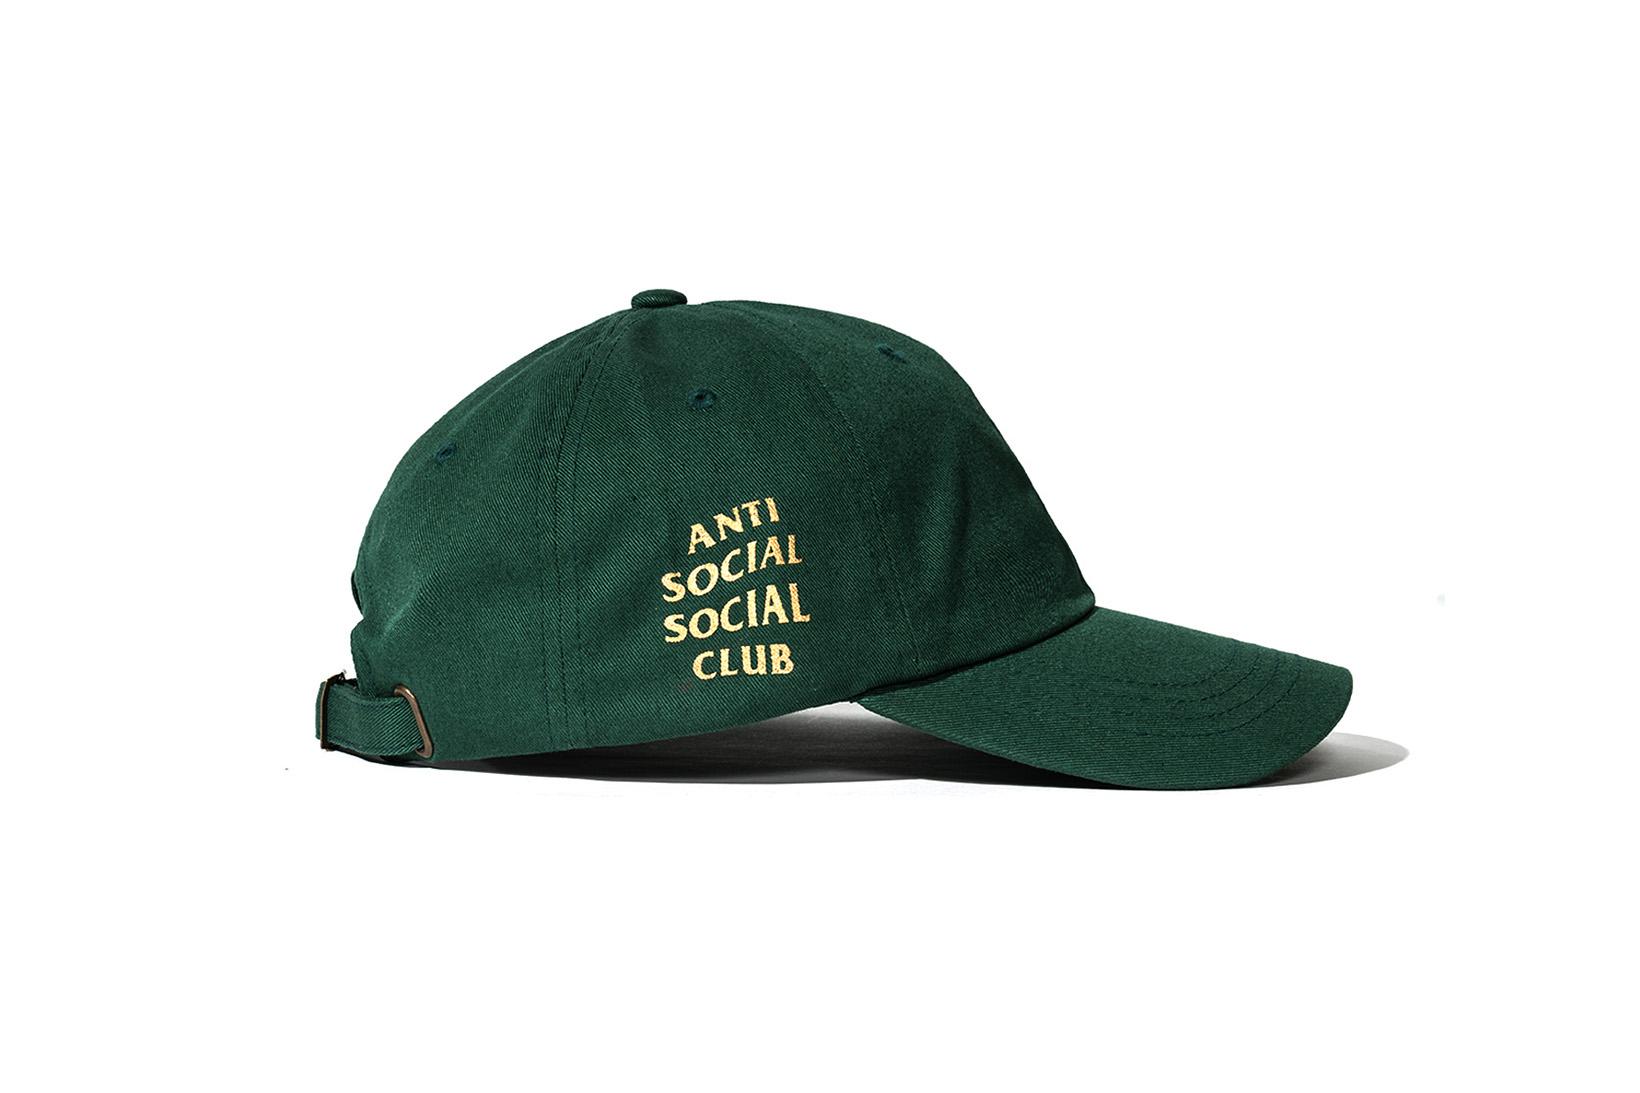 Anti Social Social Club 2017 Spring Summer - 3744381